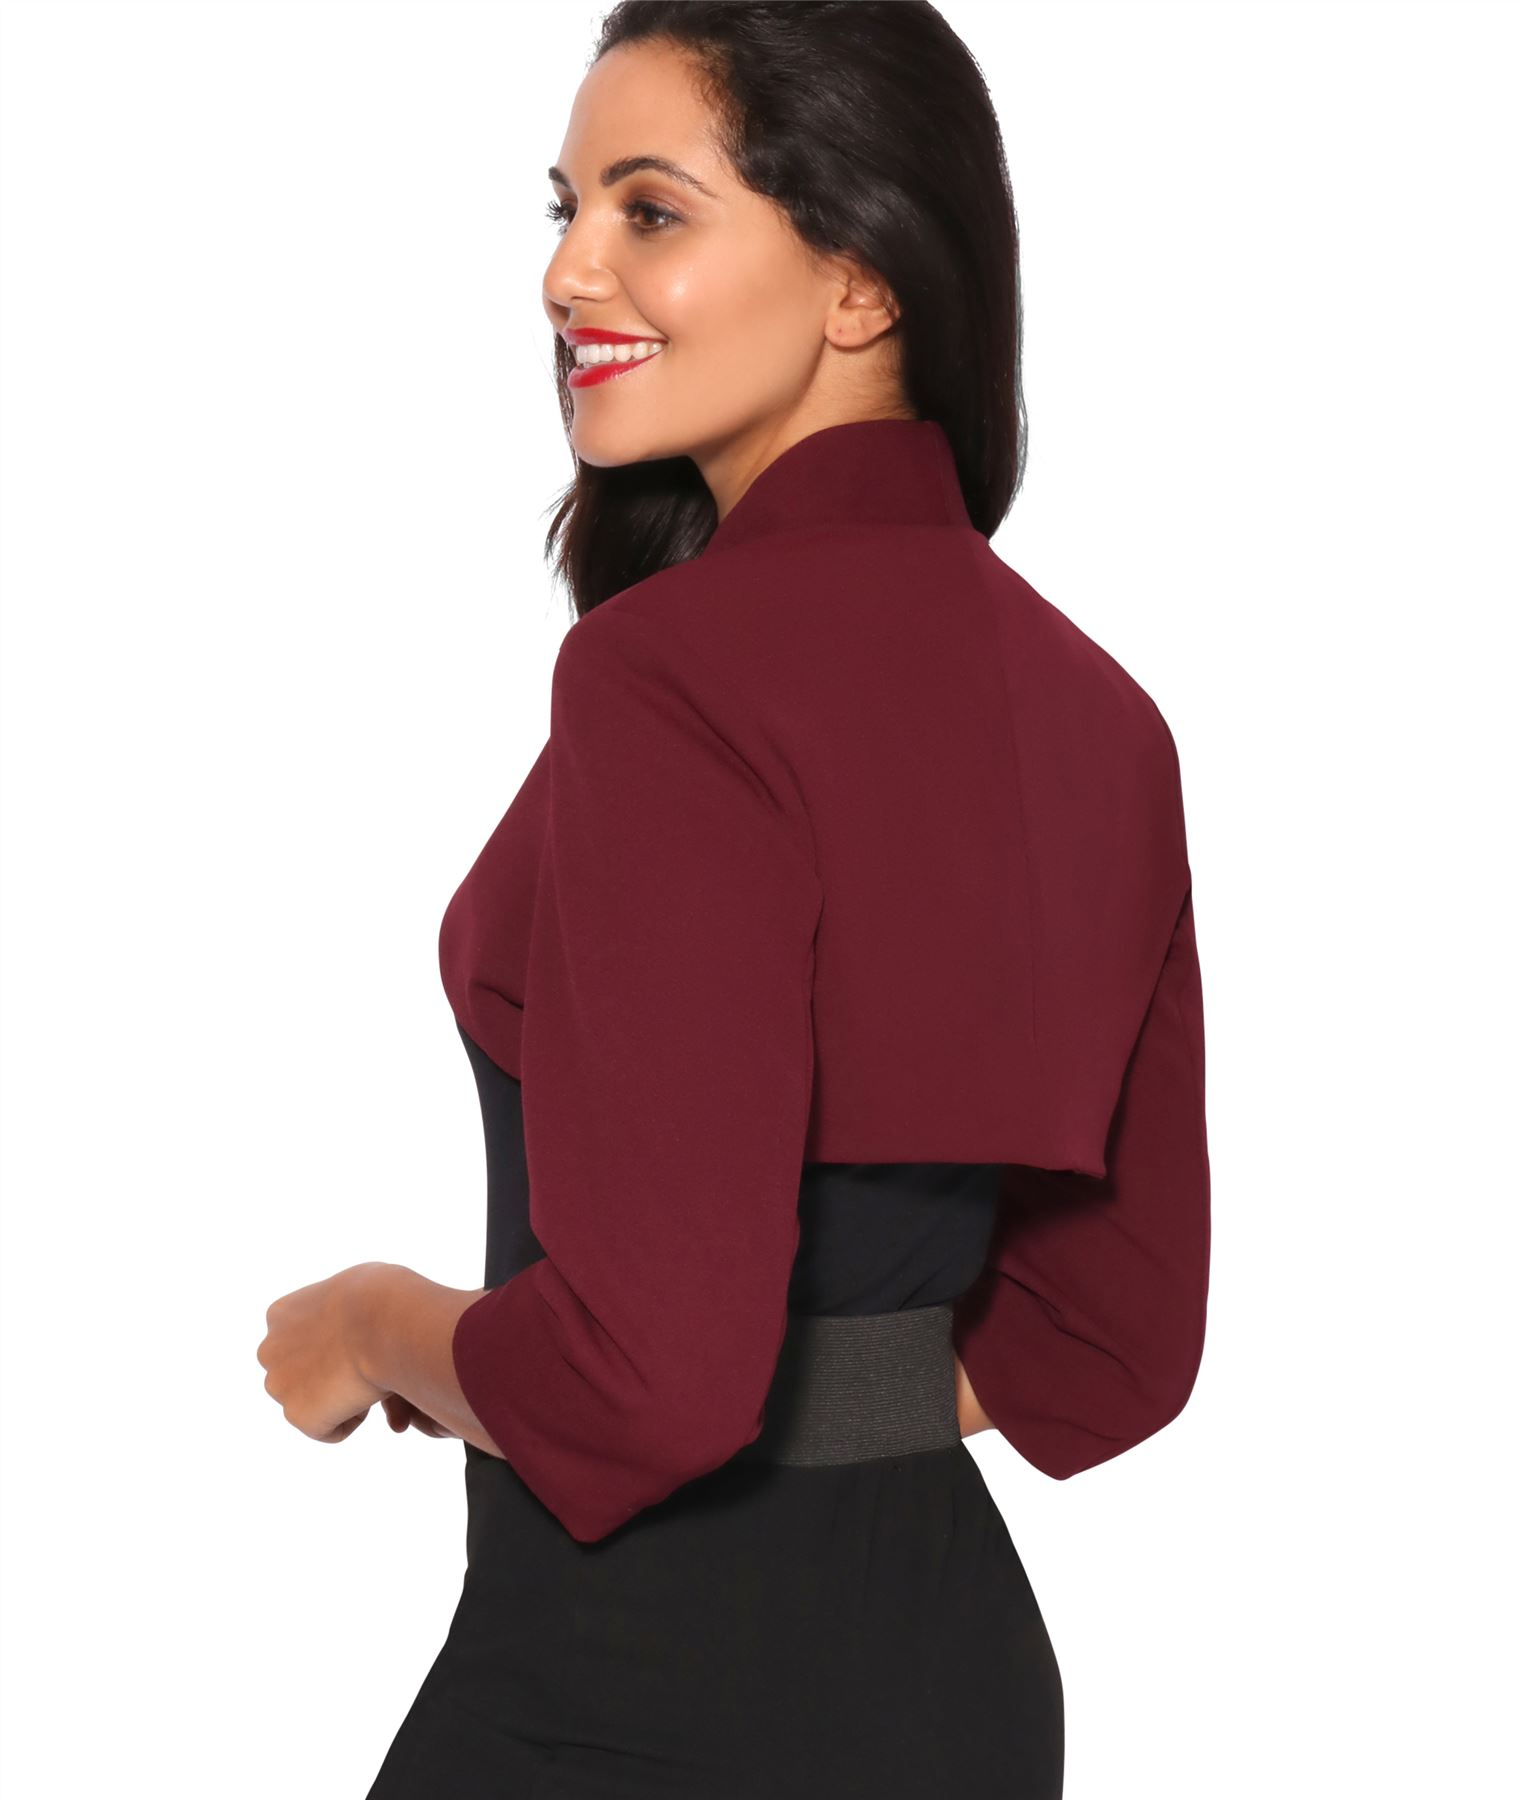 Womens-Tailored-Bolero-Shrug-Cropped-Top-Short-Sleeve-Party-Blazer-Jacket-Coat thumbnail 26